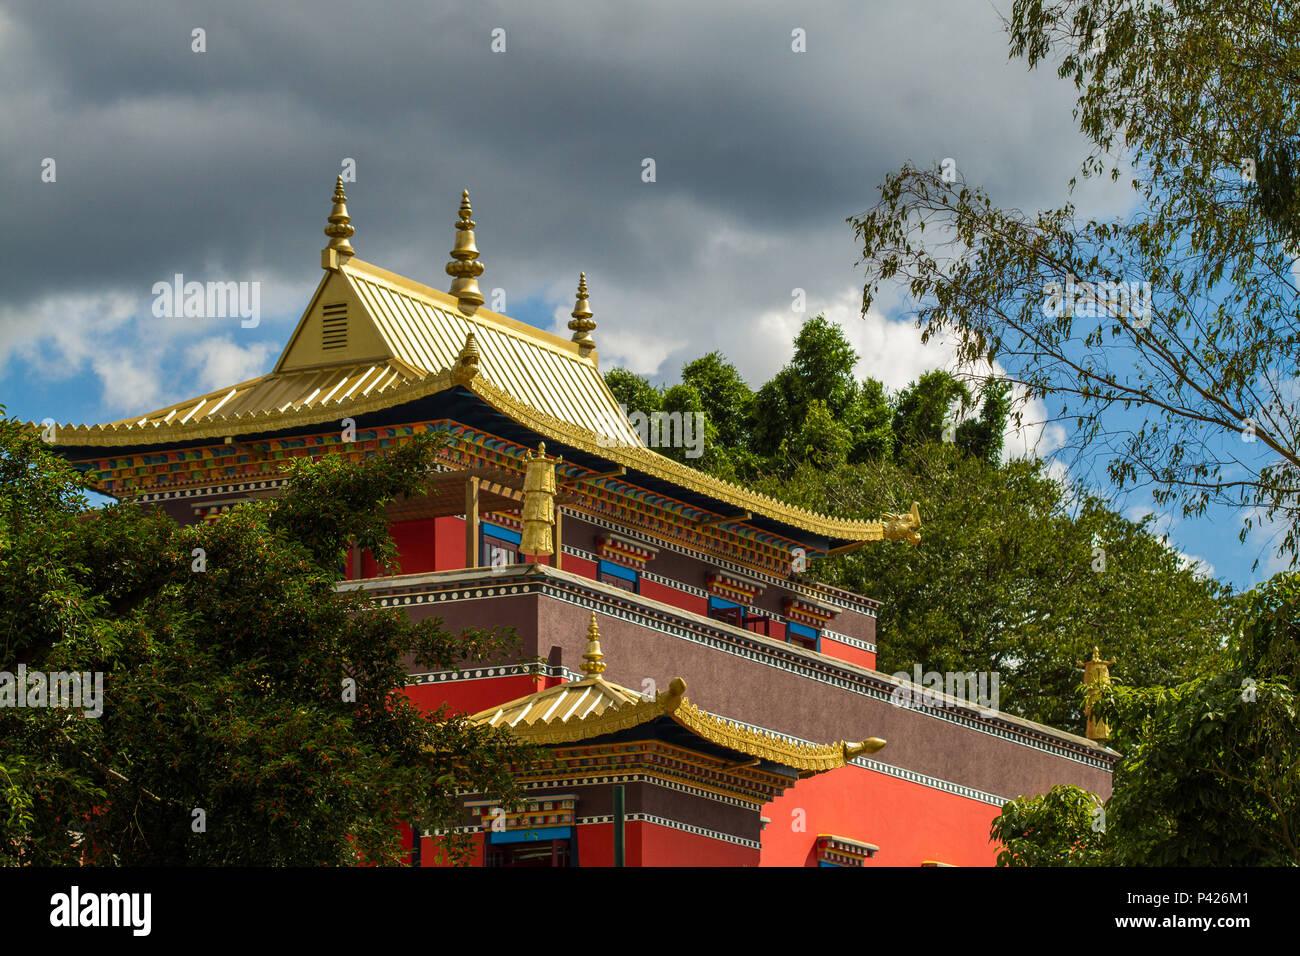 Templo Chagdud Gonpa Odsal Ling , Templo budista tibetano, Cotia, São Paulo, Brasil. Foto de stock